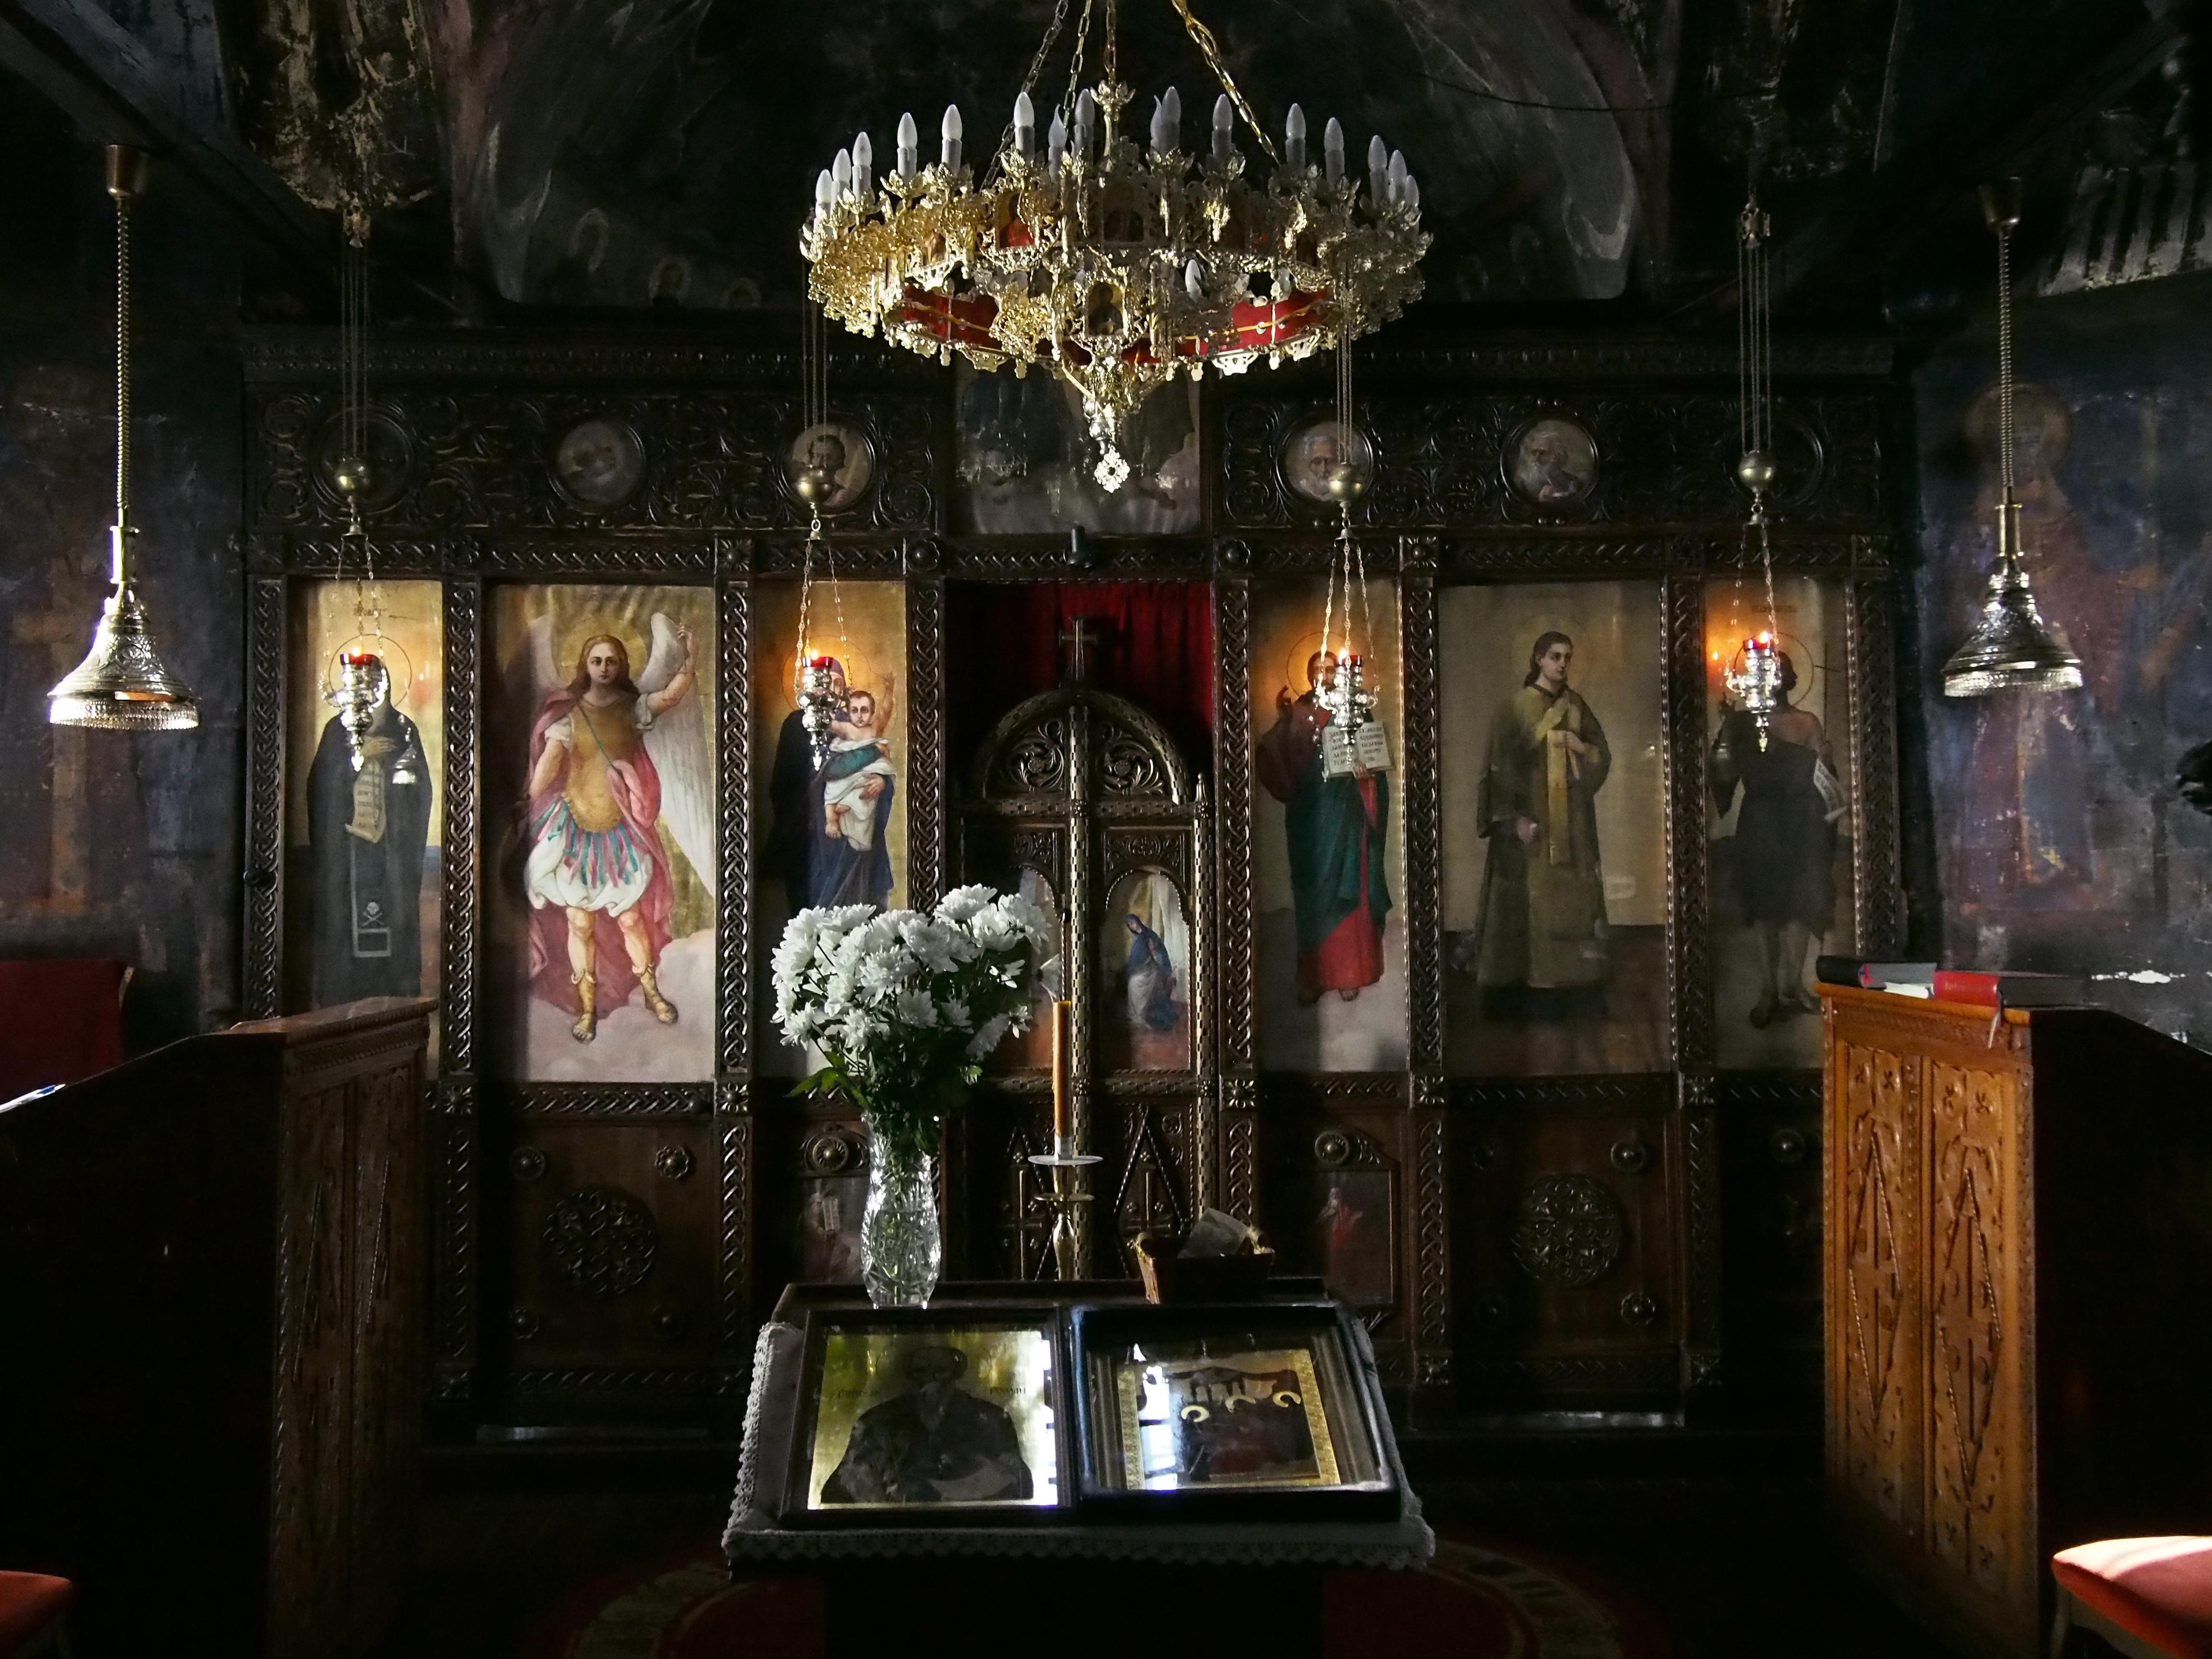 Manastir_Sveti_Roman_-_unutrašnjost.JPG